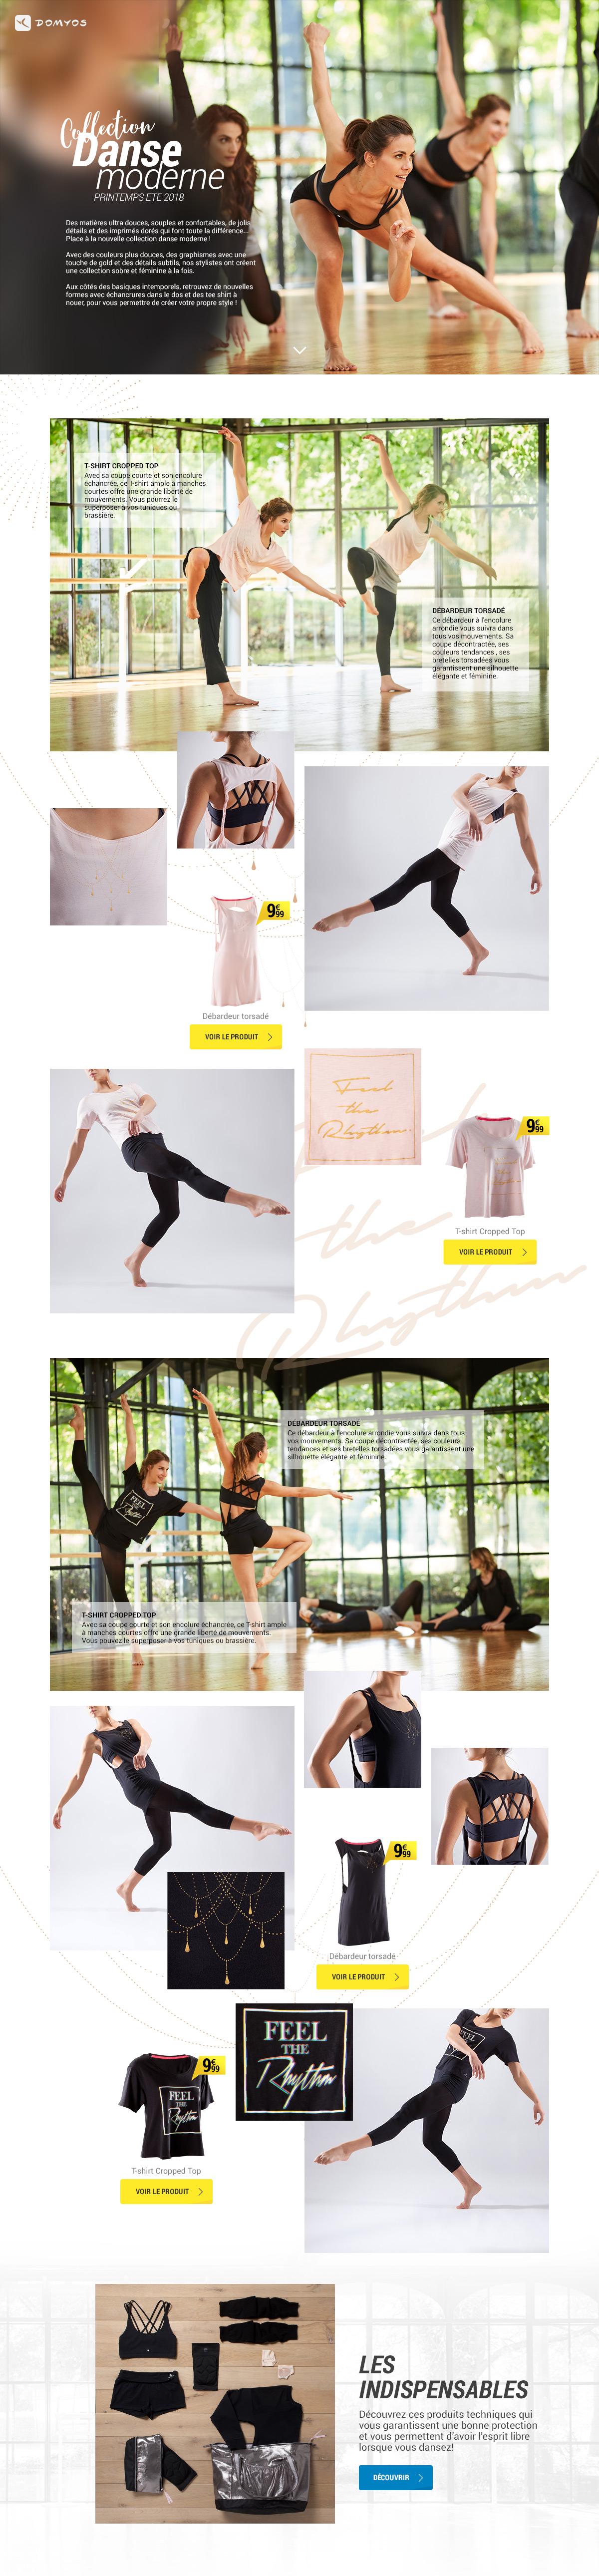 Domyos   Lookbook Danse moderne 2018